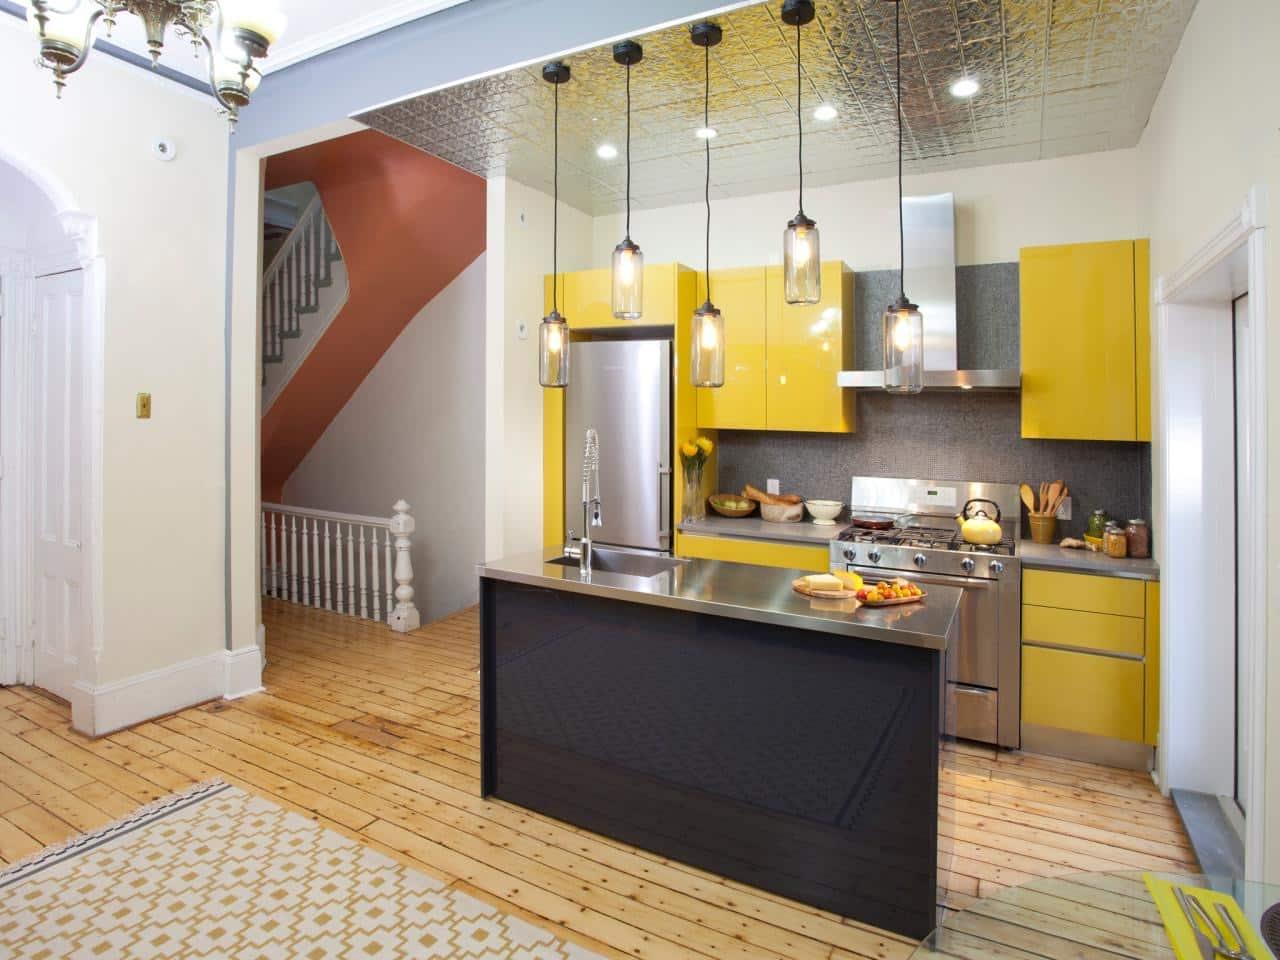 Dapur Cerah Warna Kuning Ala Cafe Thegorbalsla